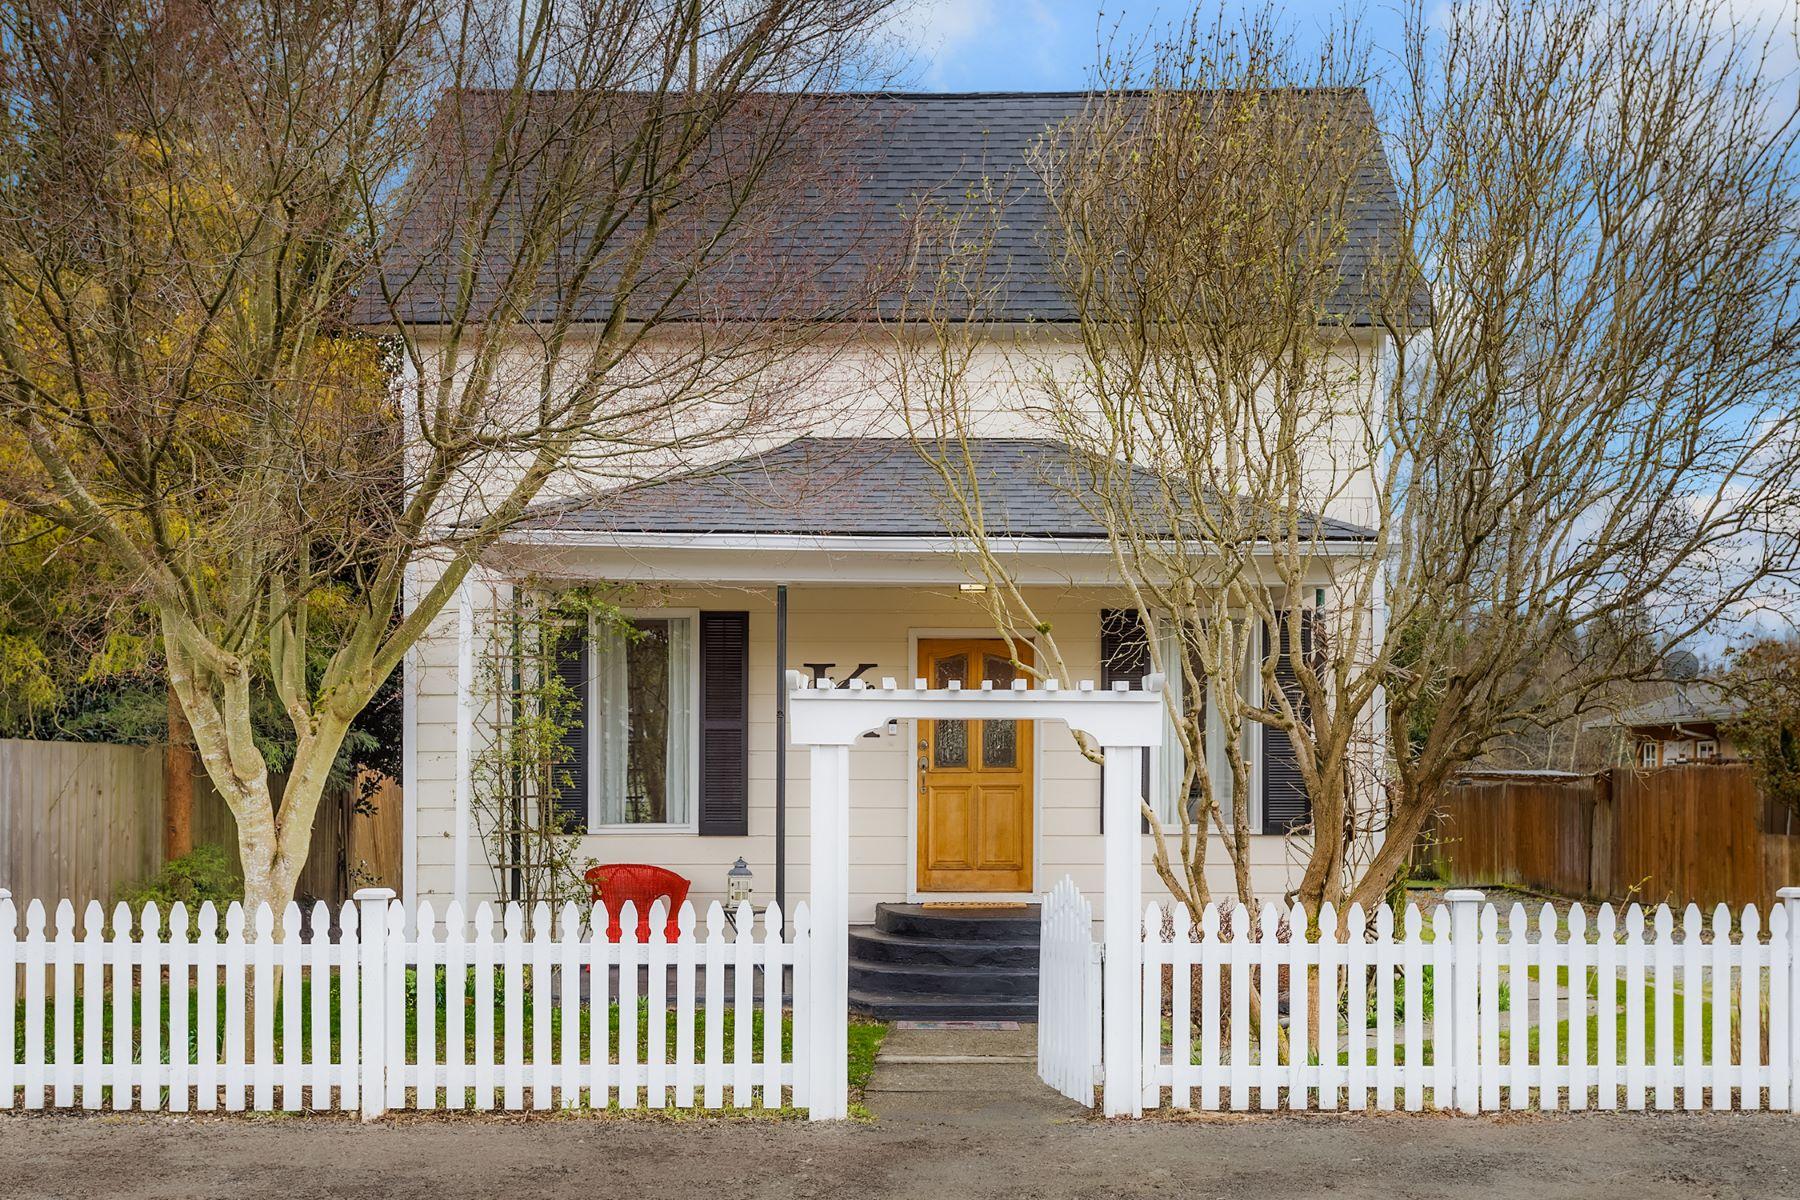 Single Family Homes for Sale at Snohomish, Washington 98290 United States